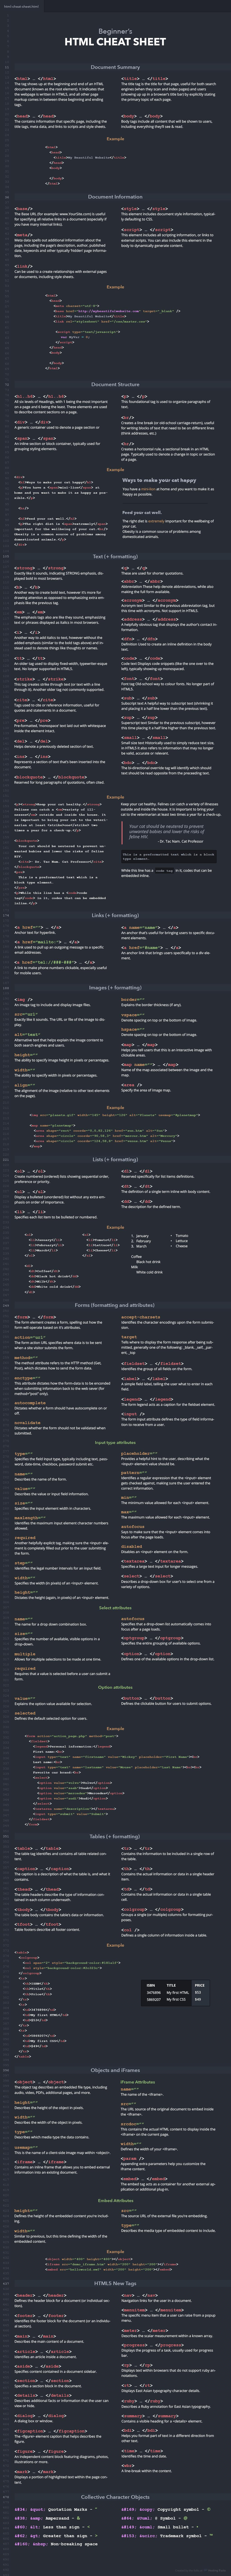 Basic Front End Developer Skills #programmer